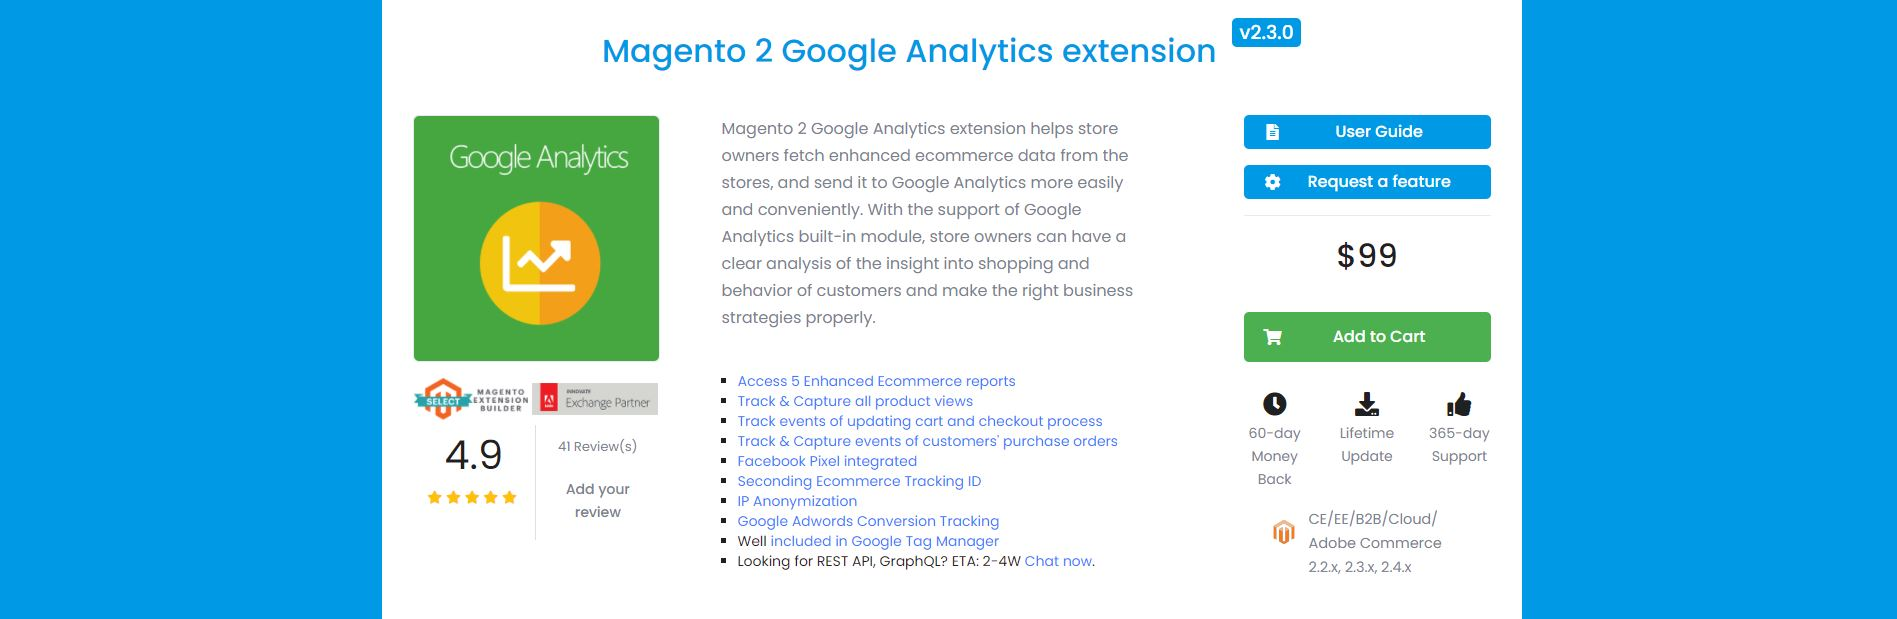 Magento google analytics extension